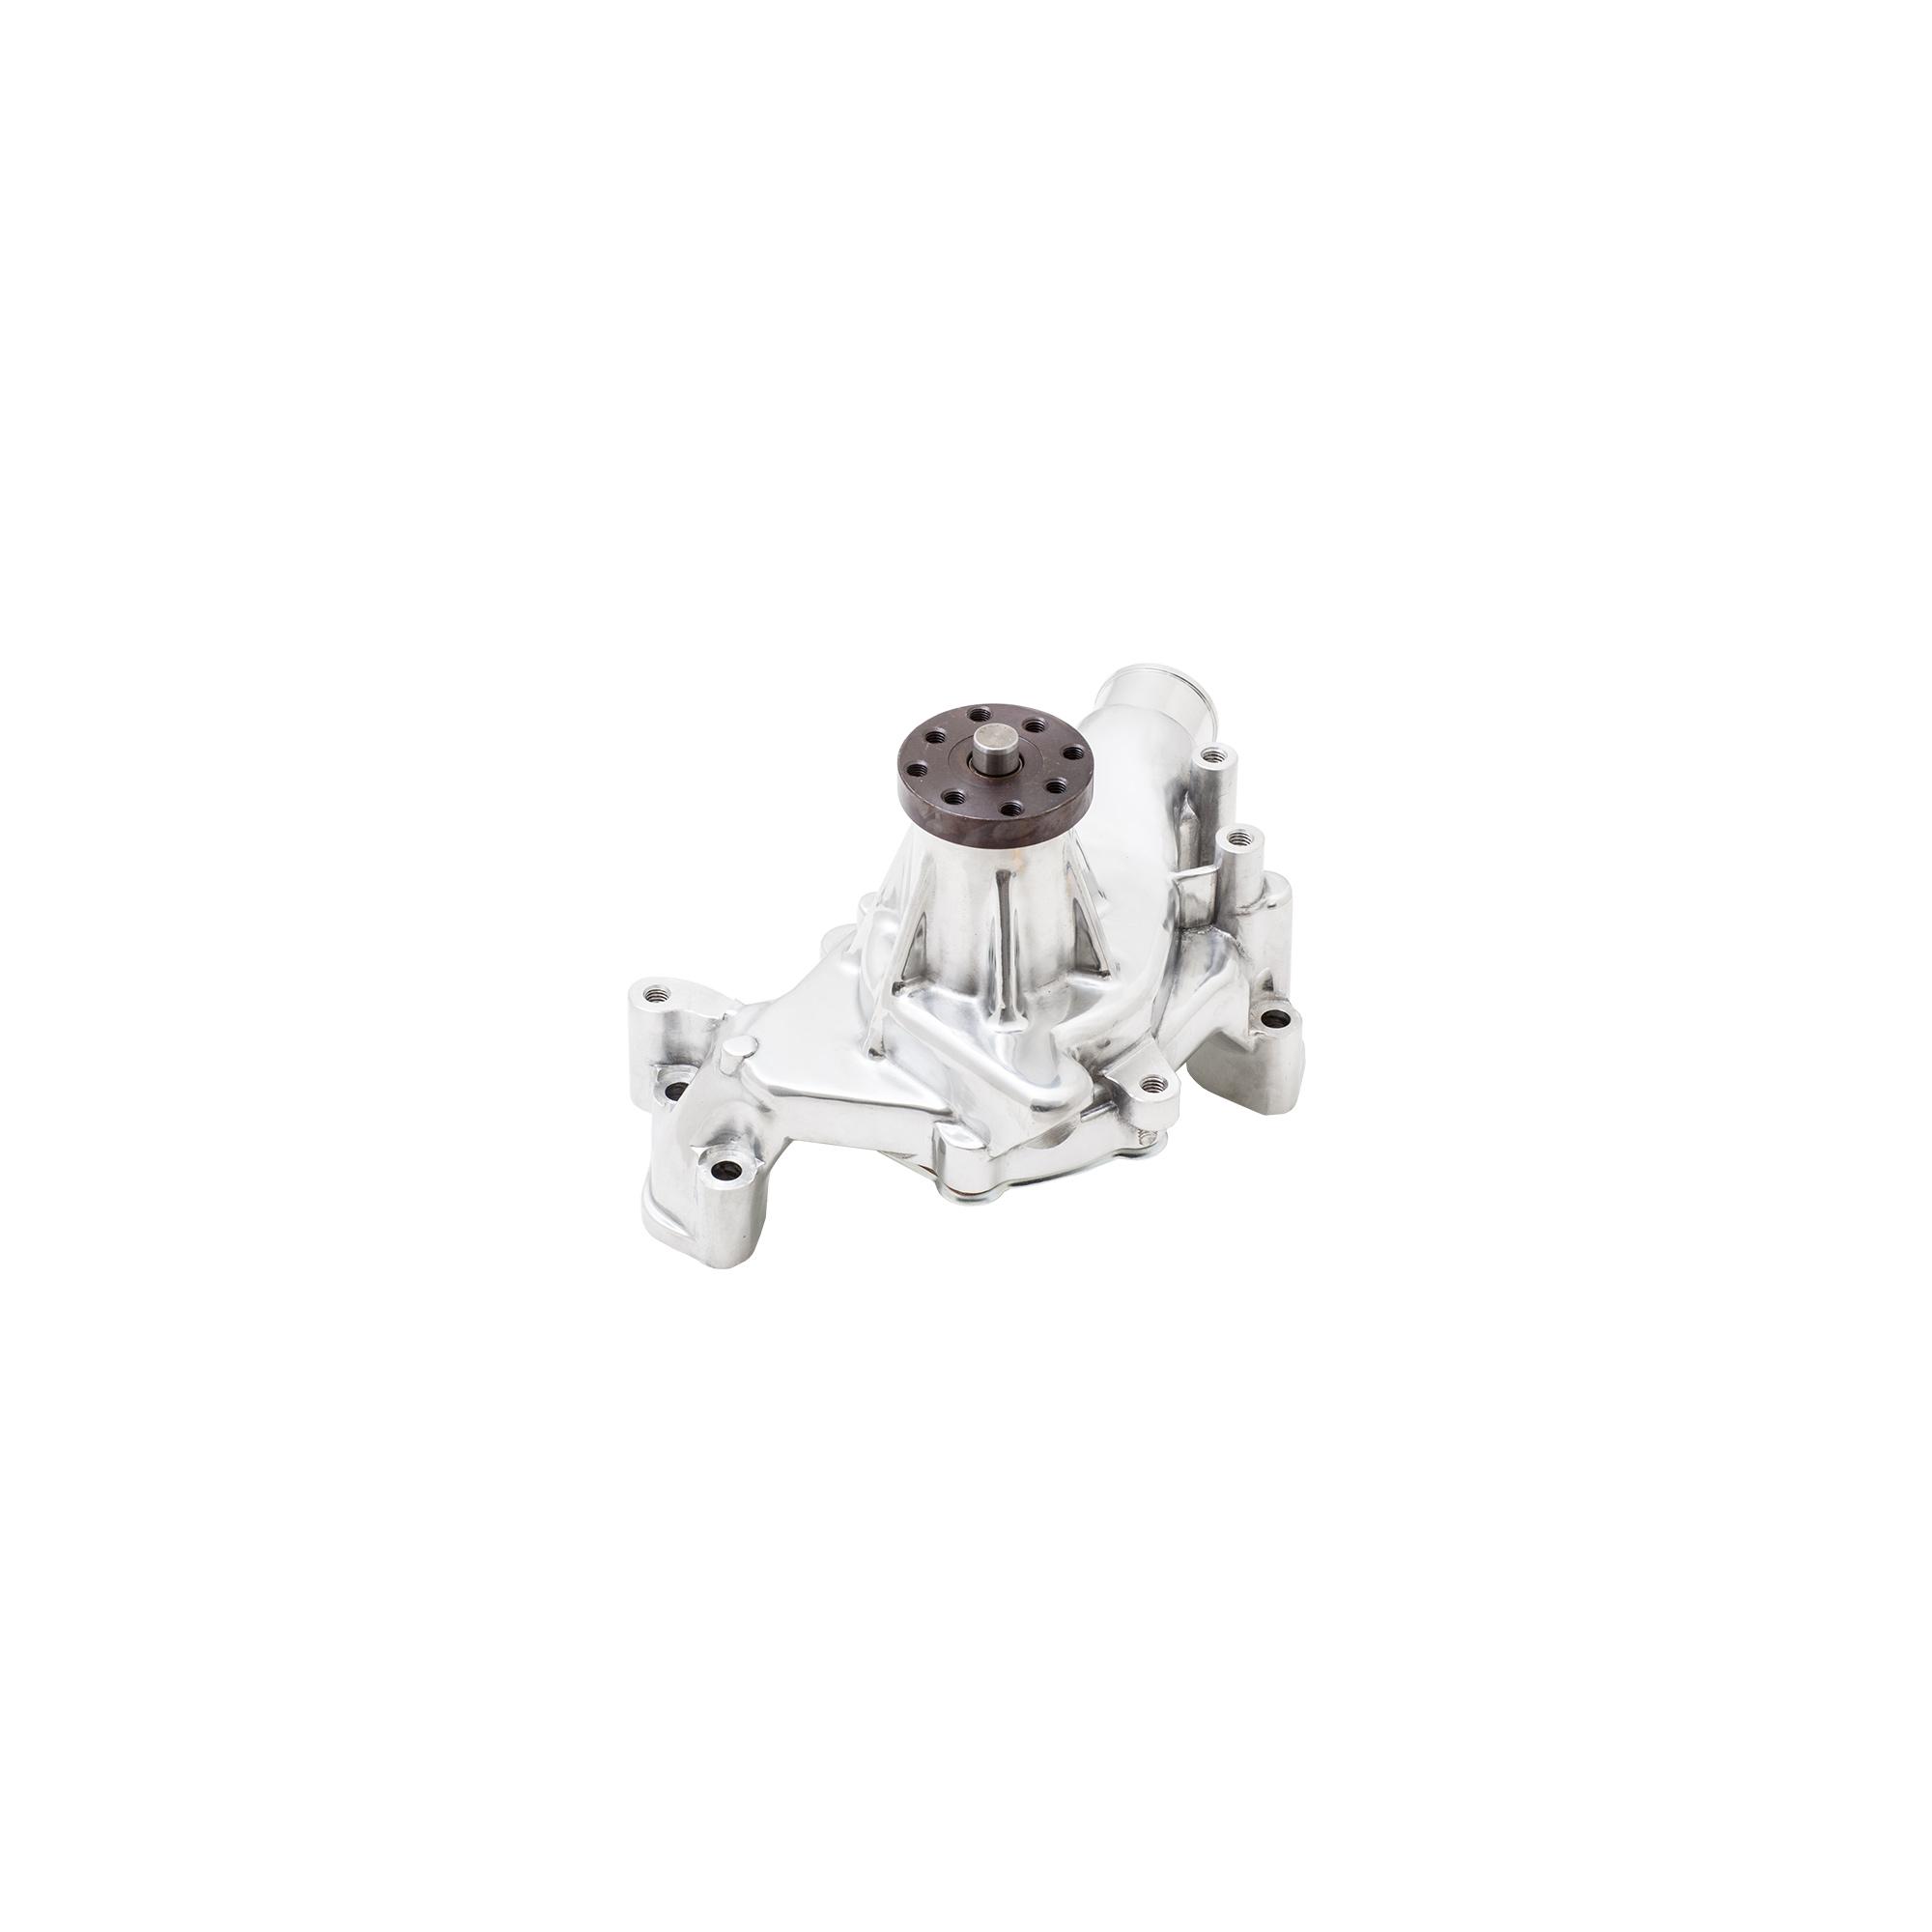 sbc long-style reverse rotation water pump